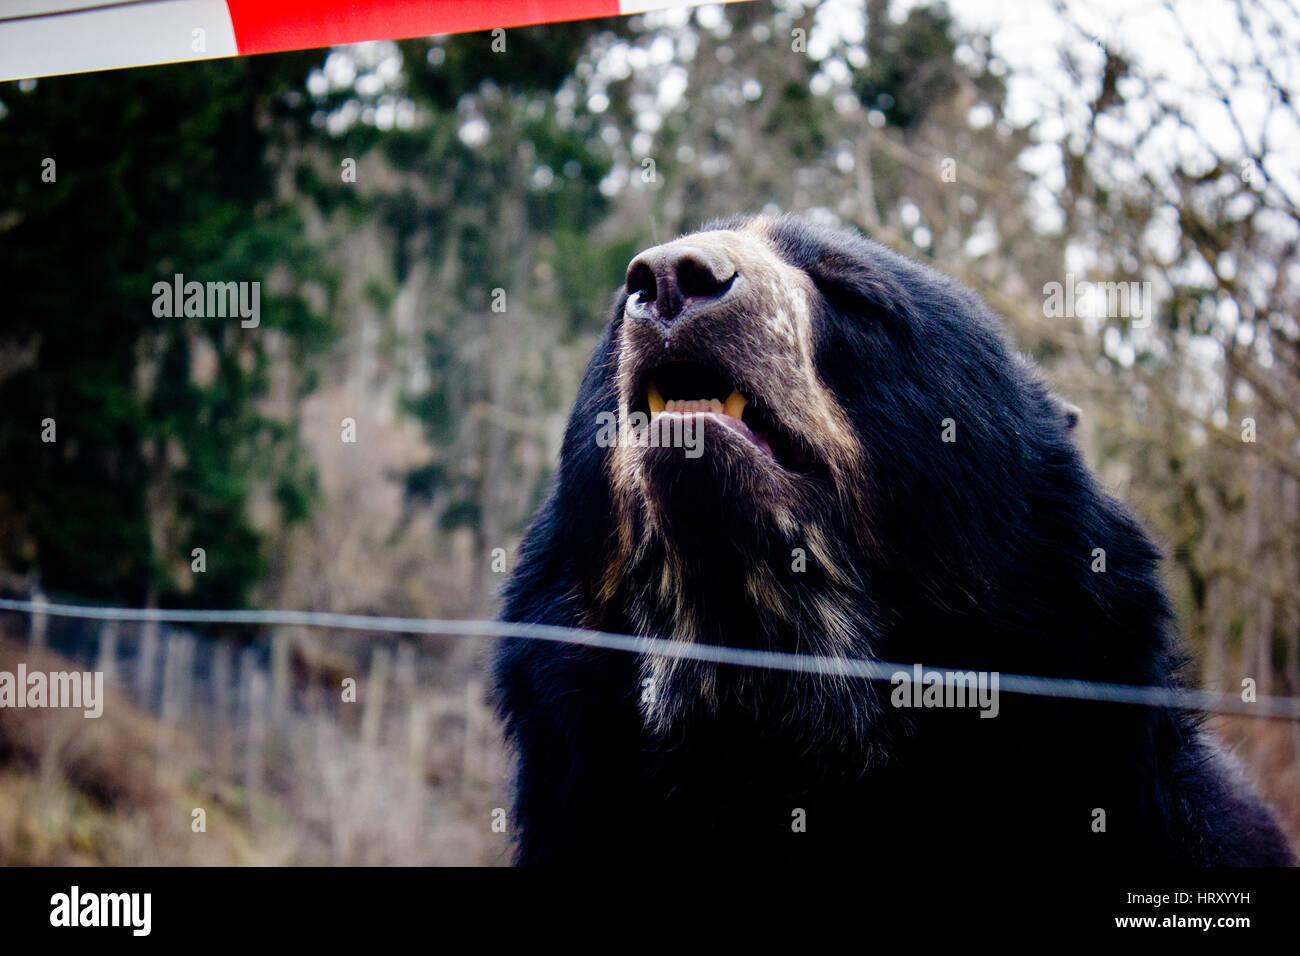 Kragenbär im Zoo (Tierpark Herberstein) - Stock Image